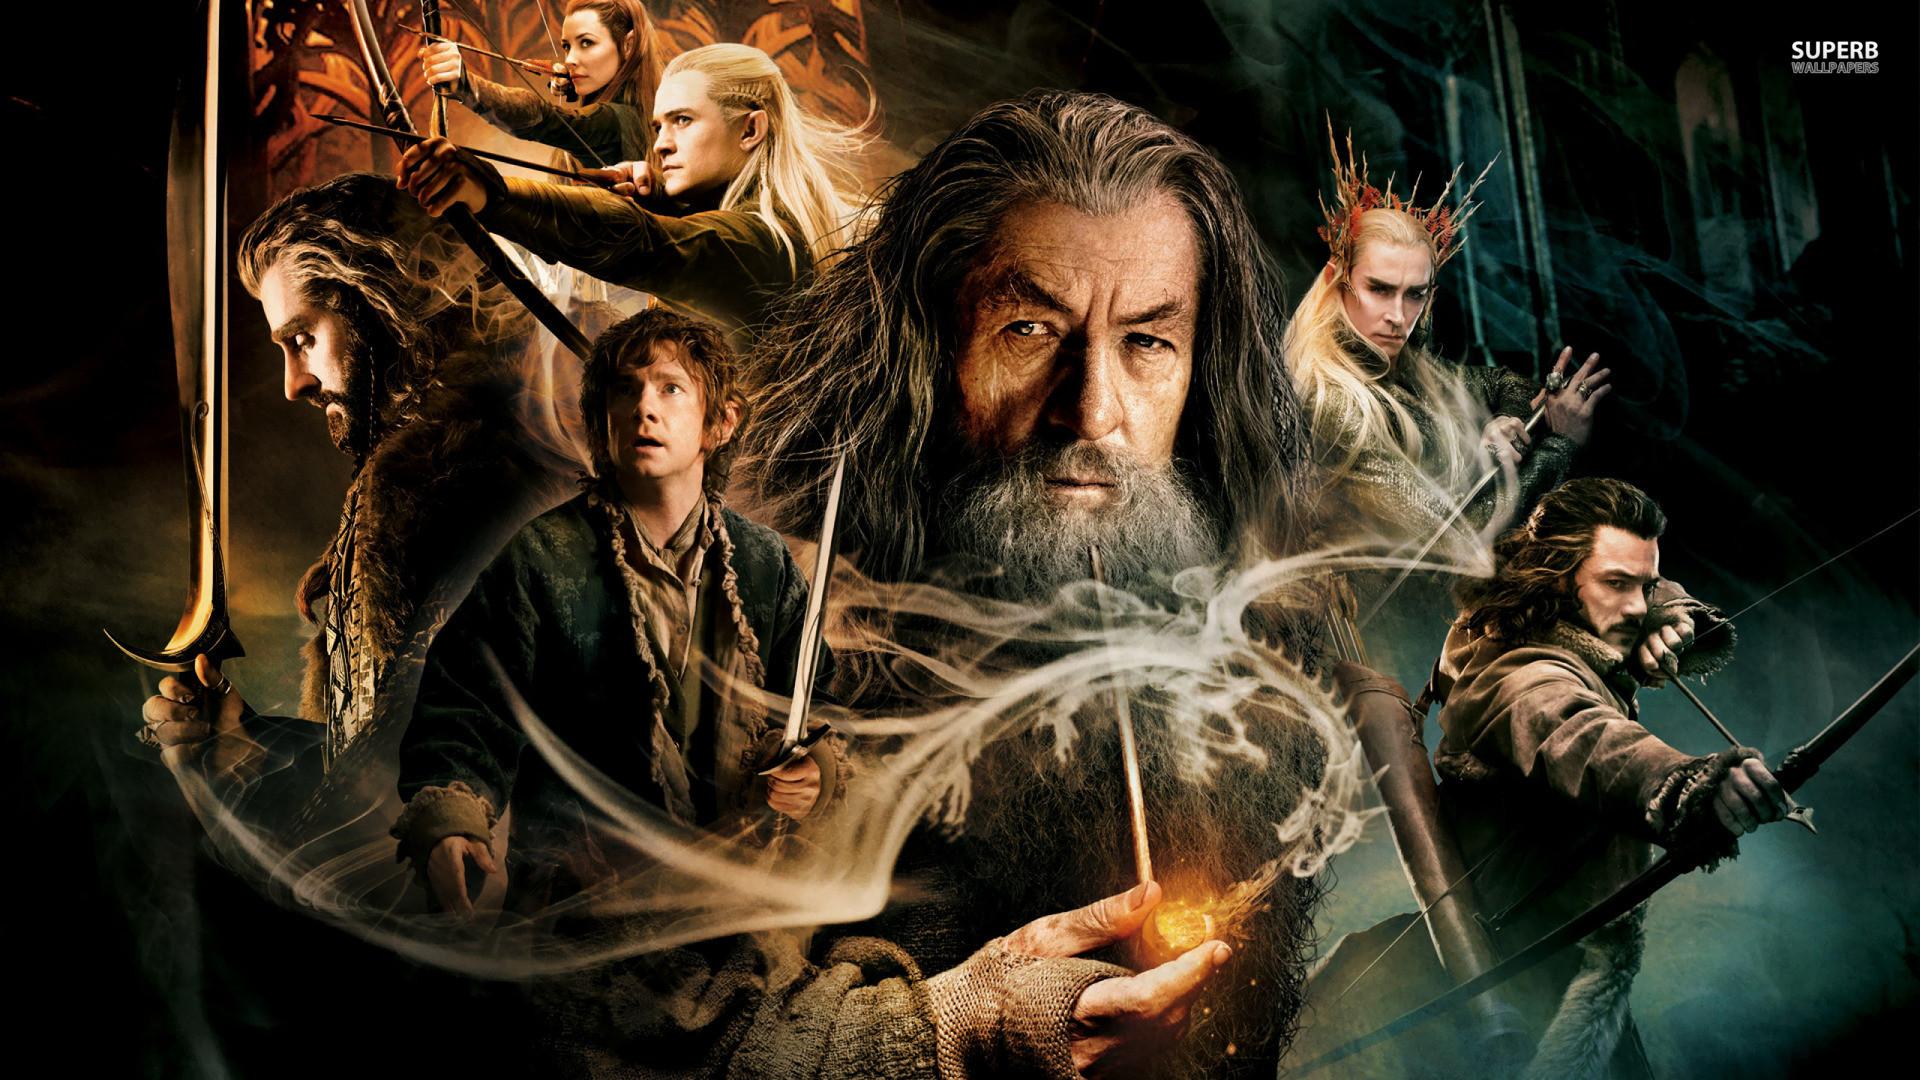 The Hobbit The Desolation of Smaug Wallpaper